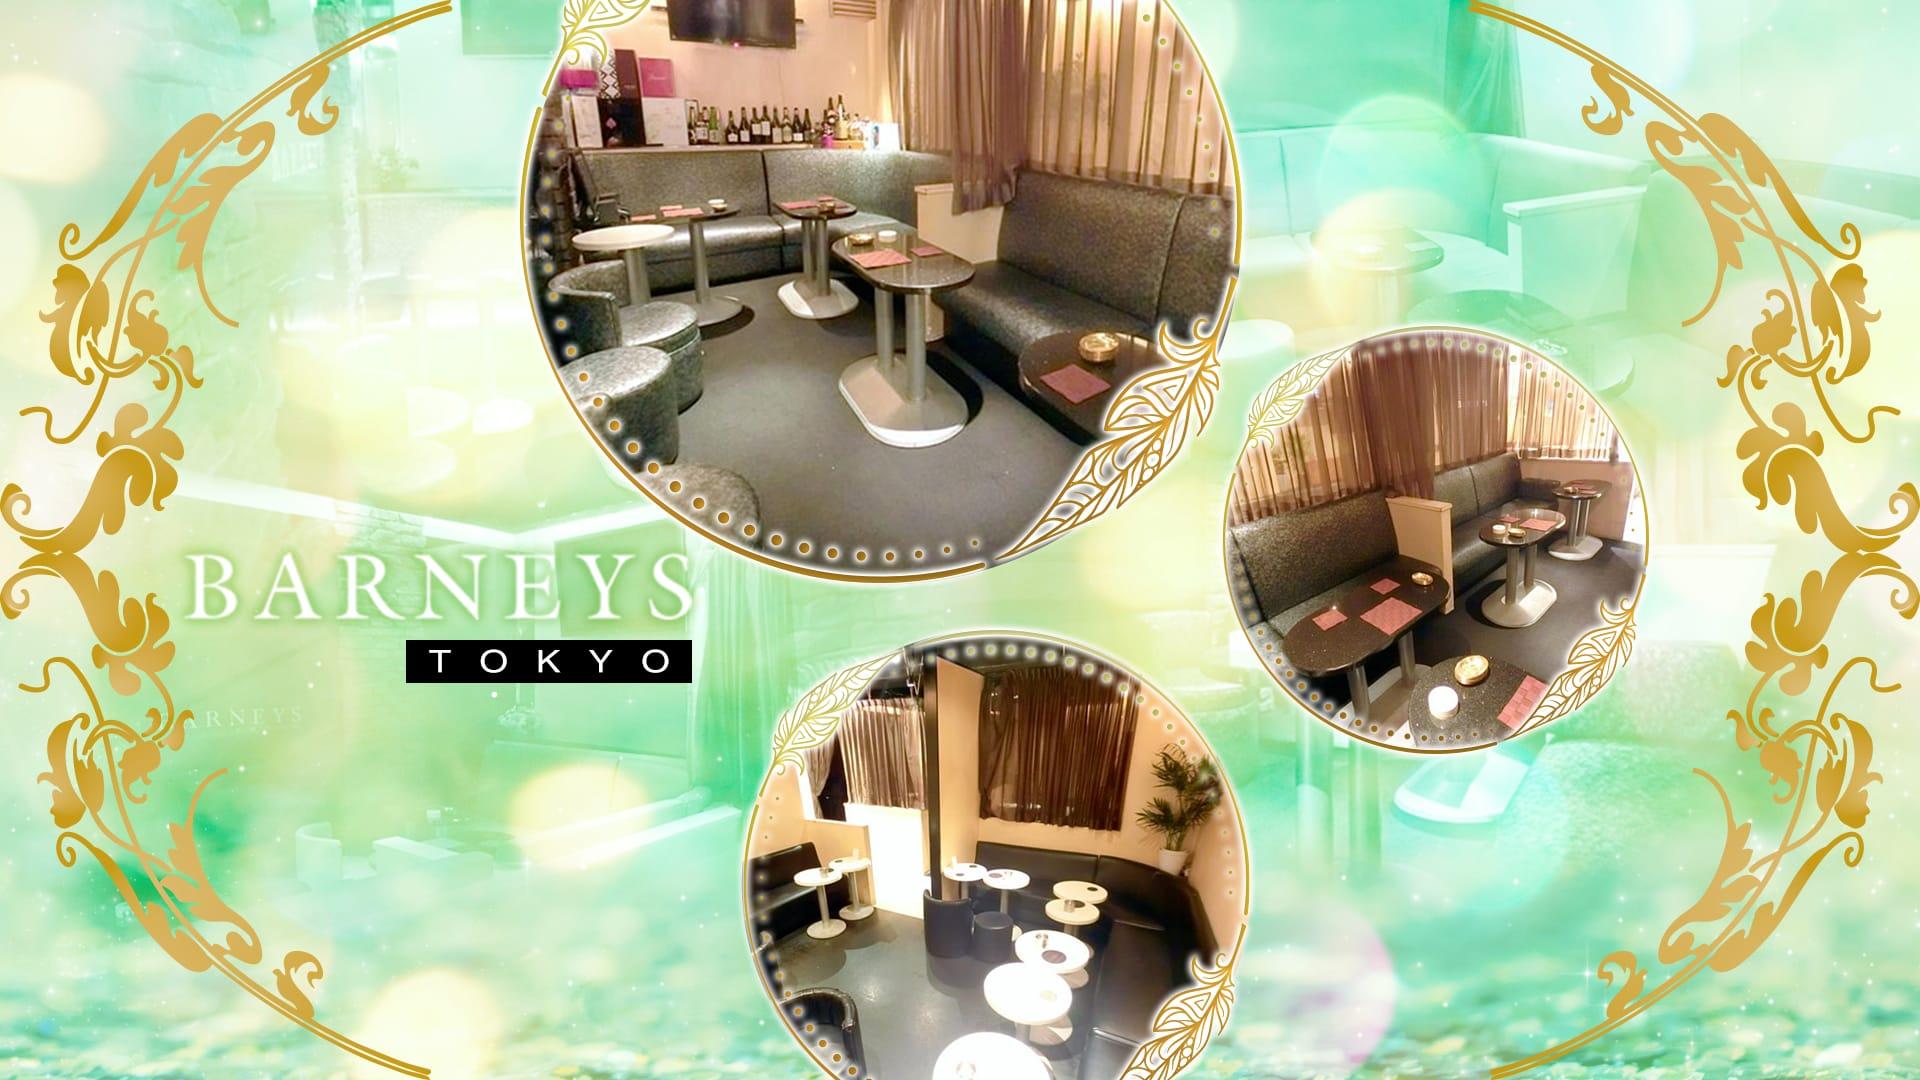 NEW CLUB BARNEYS TOKYO[バーニーズトーキョー] 渋谷 キャバクラ TOP画像